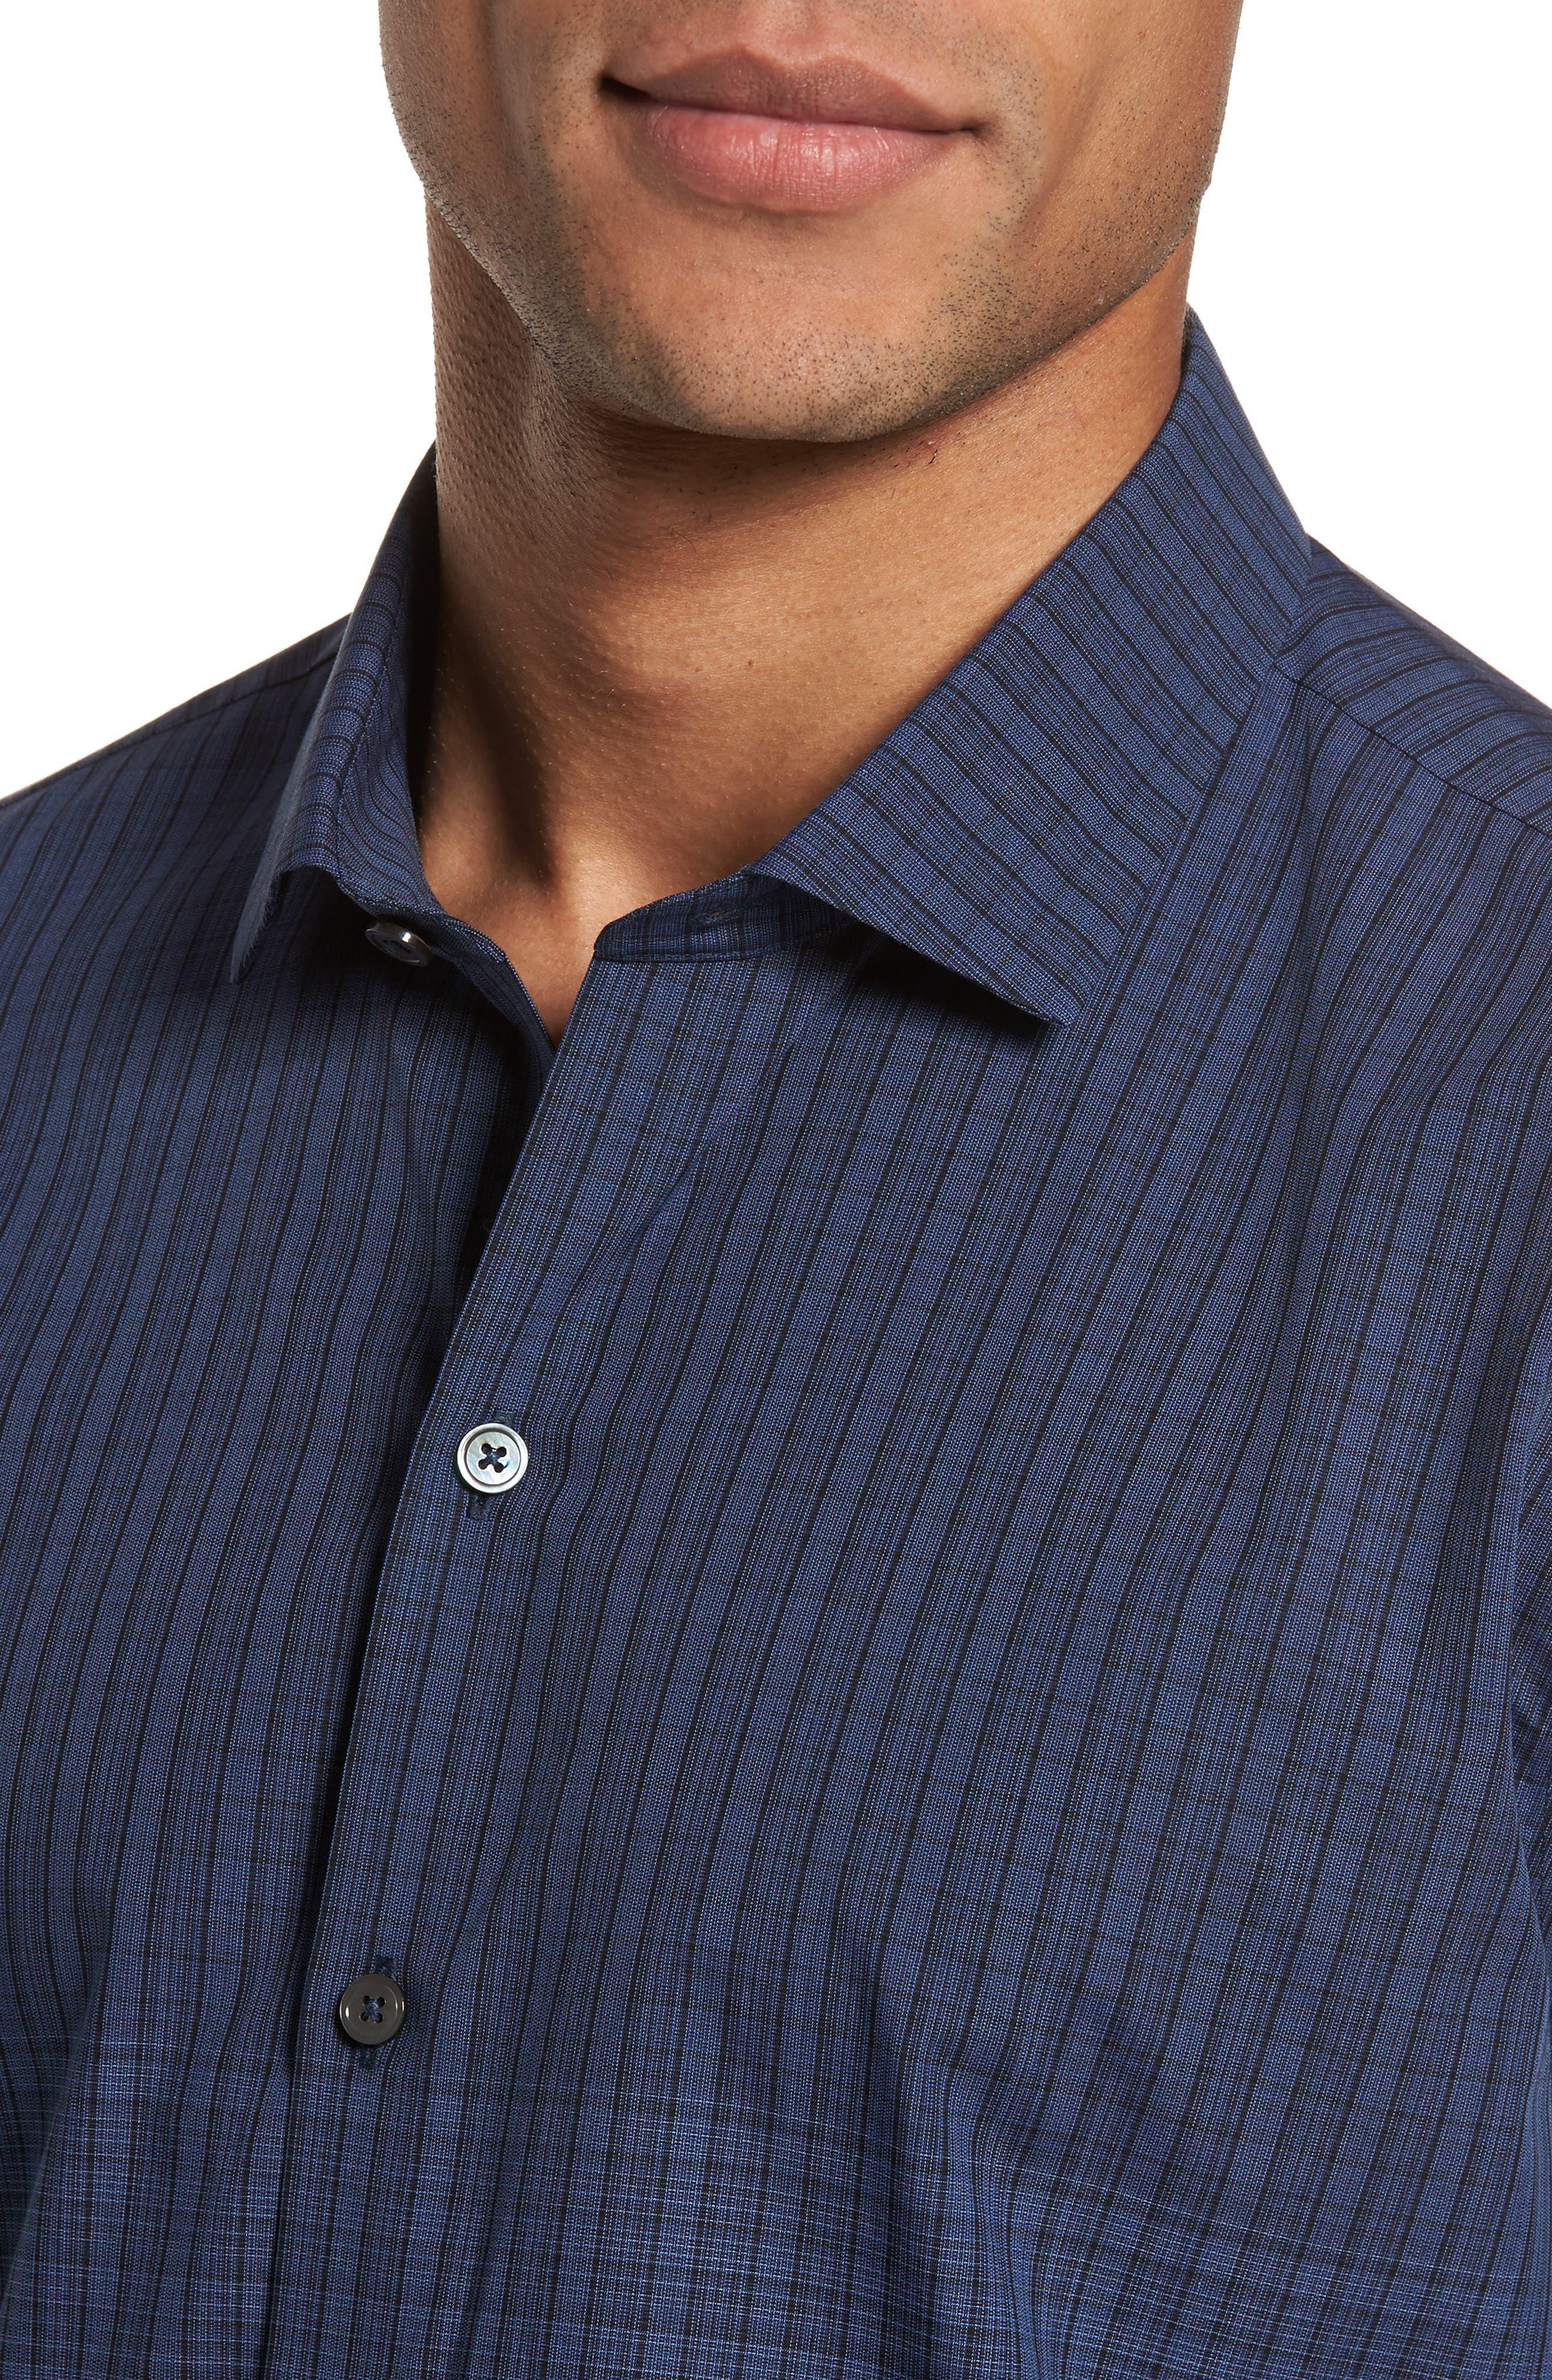 Wein Slim Fit Check Sport Shirt,                             Alternate thumbnail 4, color,                             Dark Blue